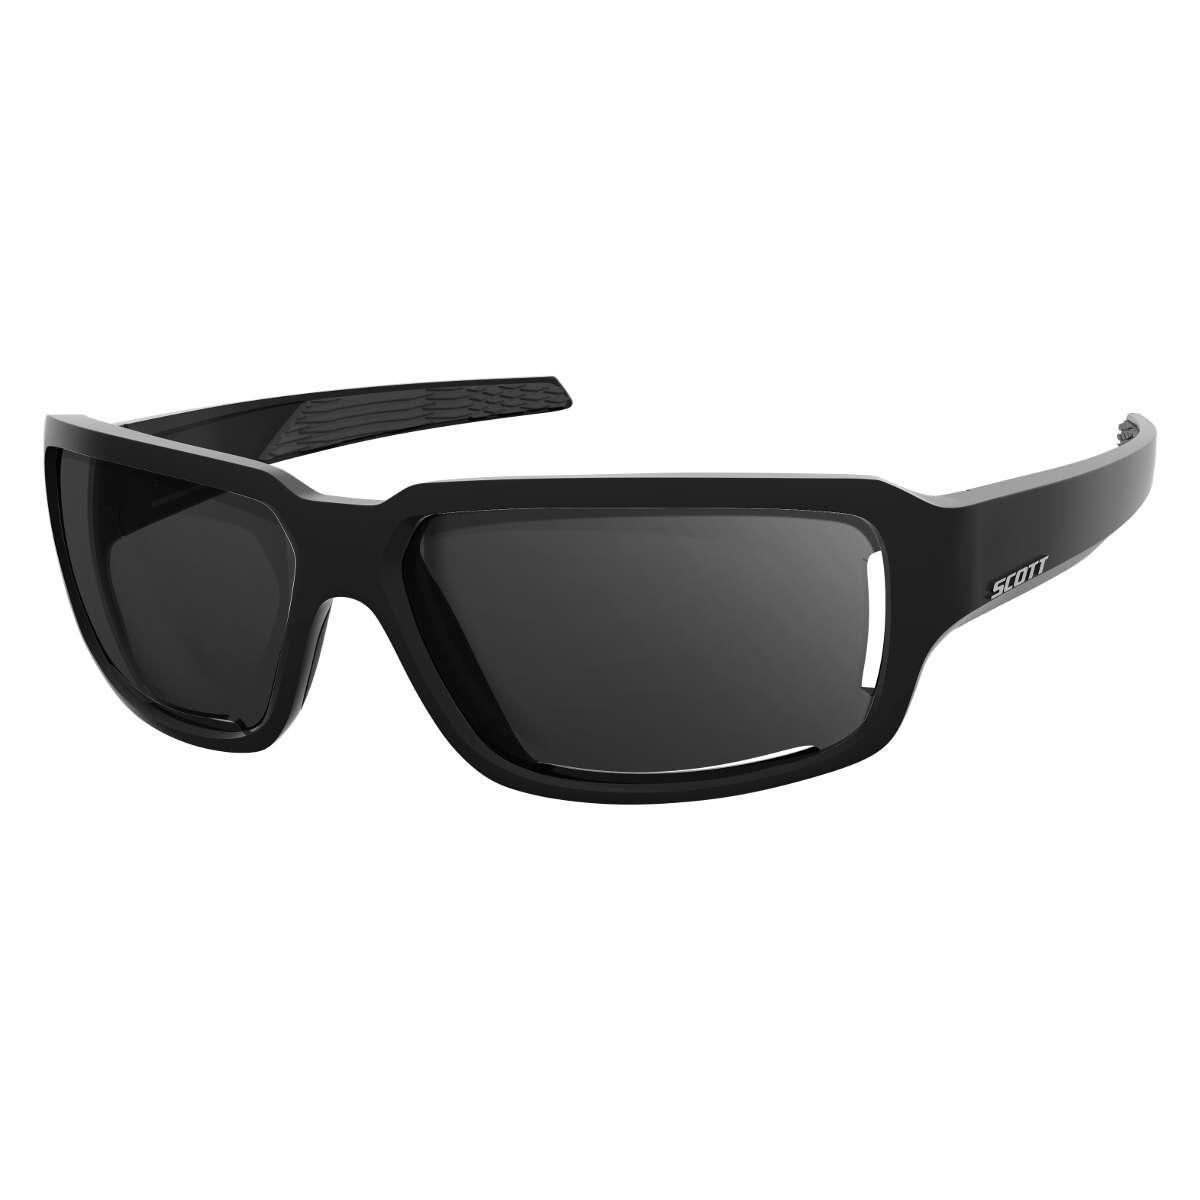 Scott Sportbrille Obsess ACS Matt-Schwarz Radsport Grey